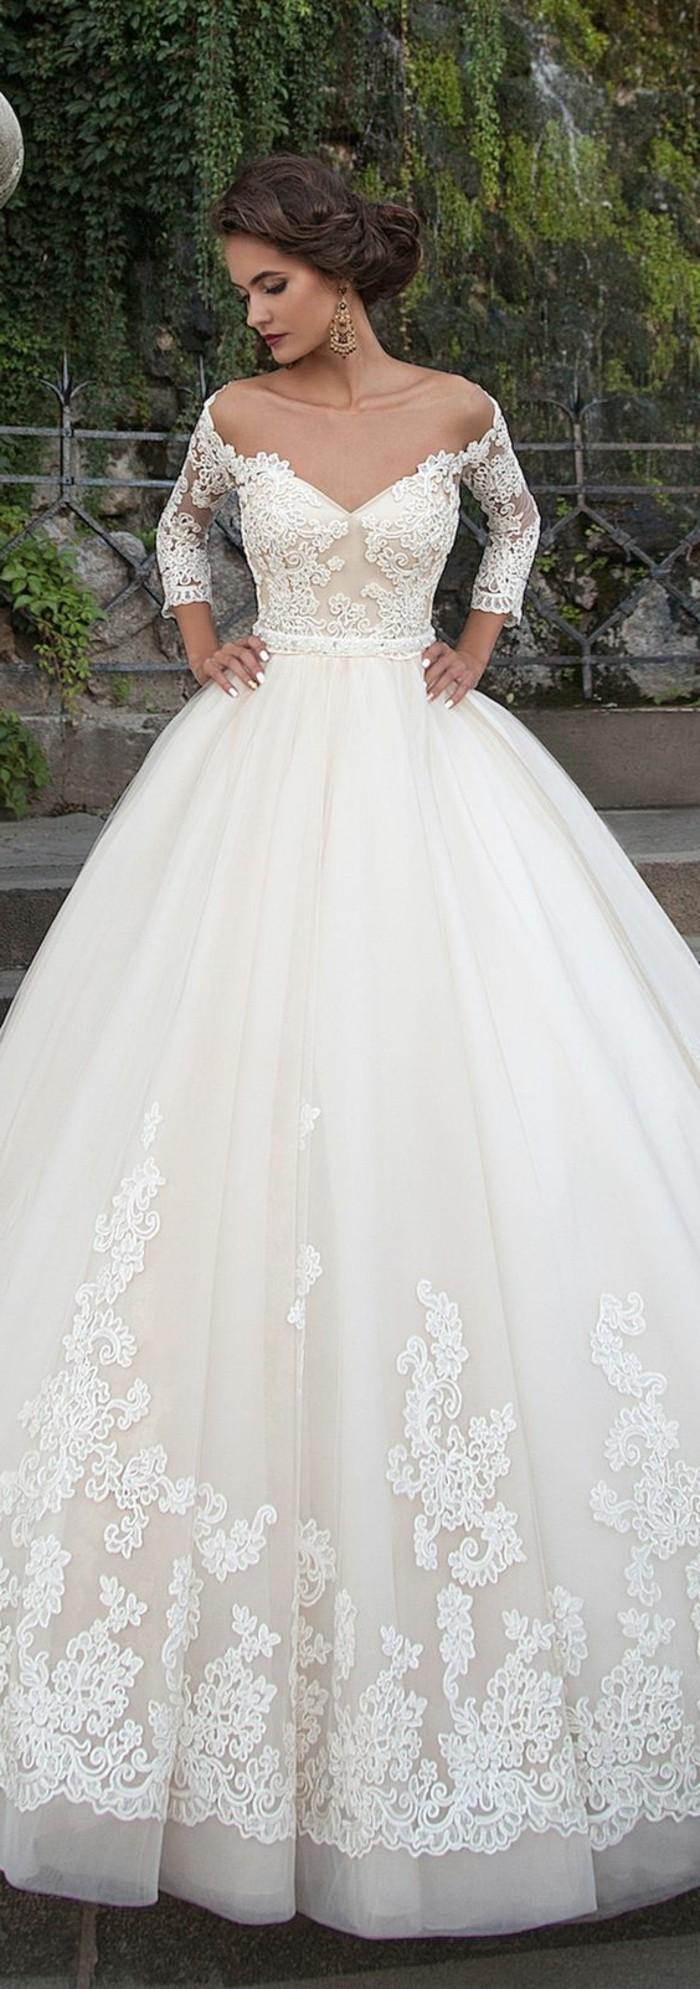 robe princesse mariage pour petite fille fashion designs